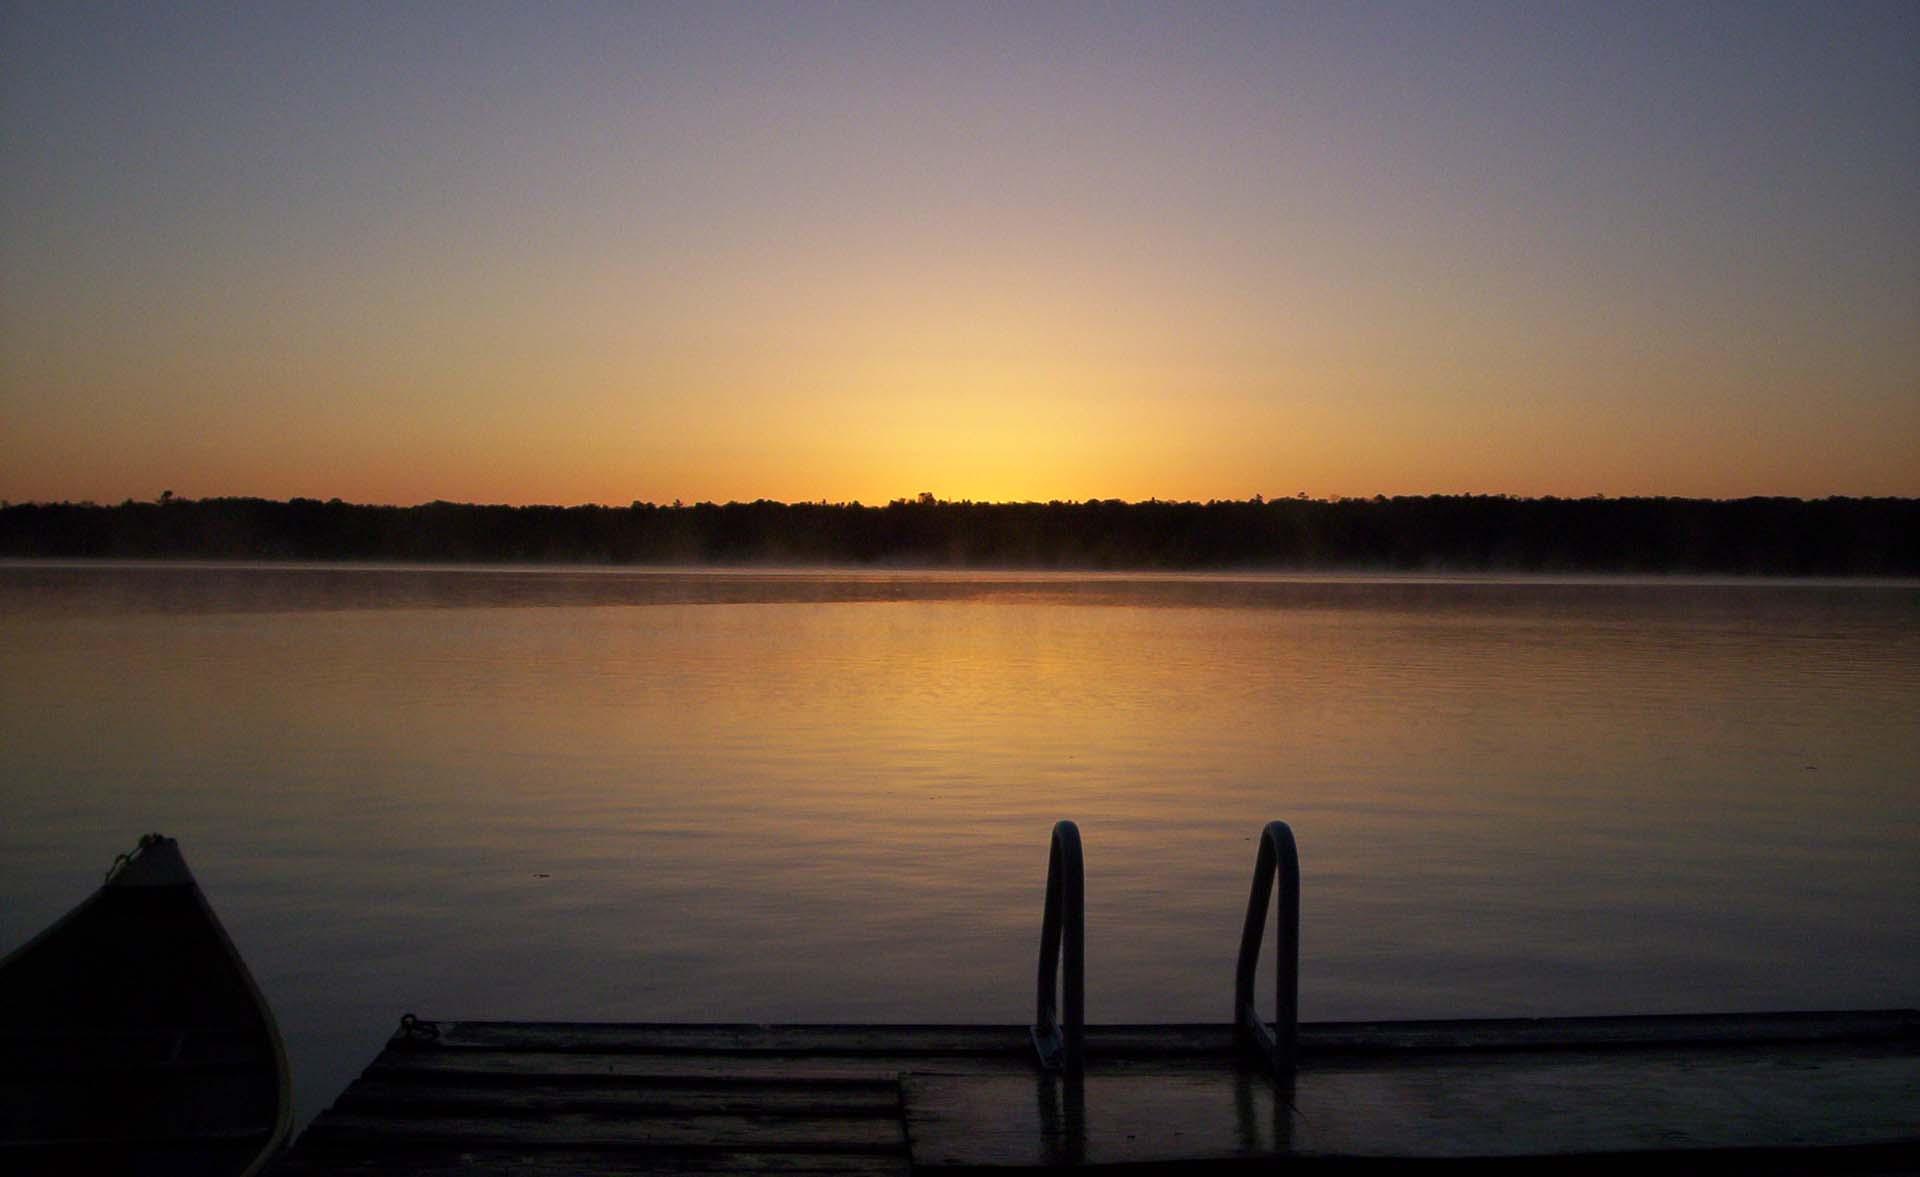 sunset-at-the-dock.jpg